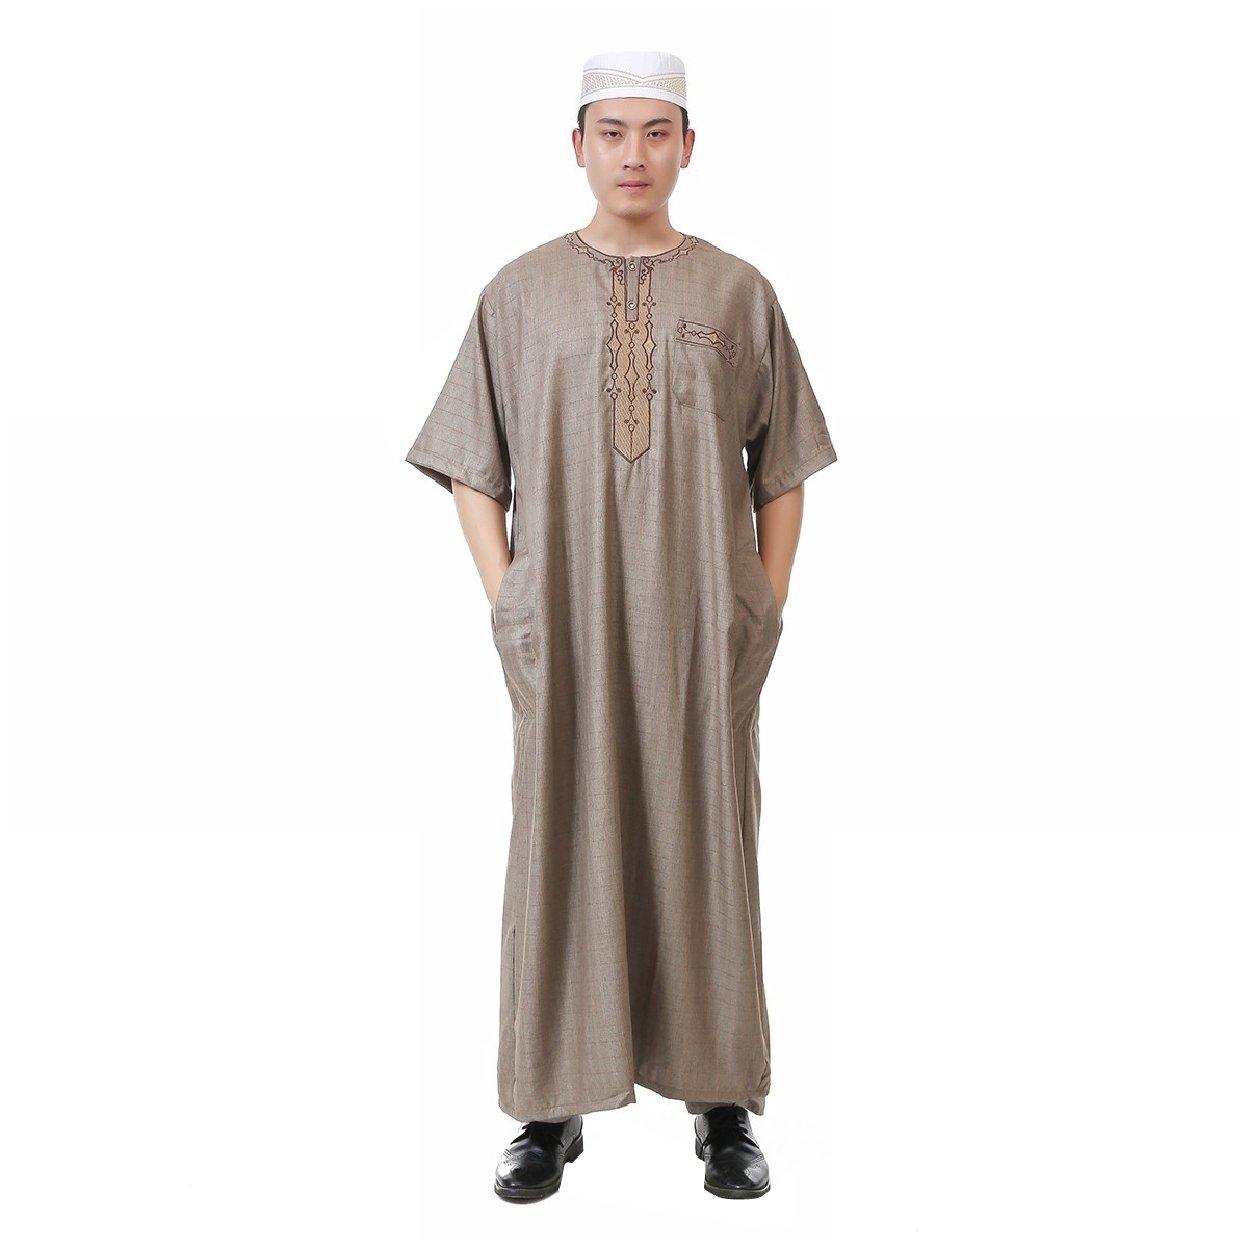 Tootless Mens Embroidered Short Sleeve Islamic Summer Arab Muslim Thobe Coffee 58